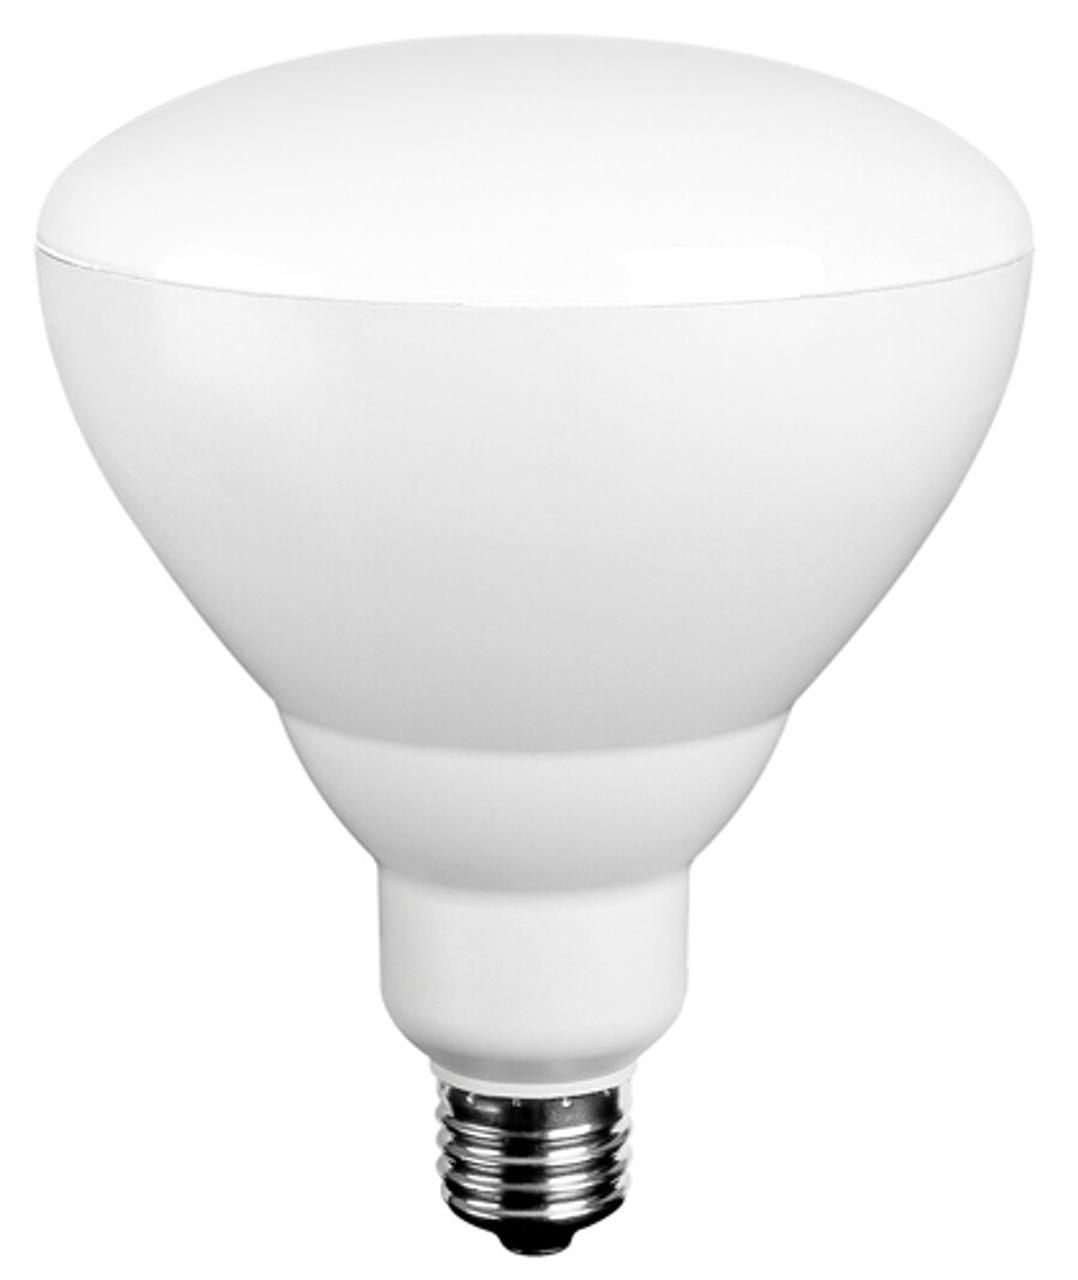 LED BR40 Bulb, 15 Watts, 850 Lumens, 5000K